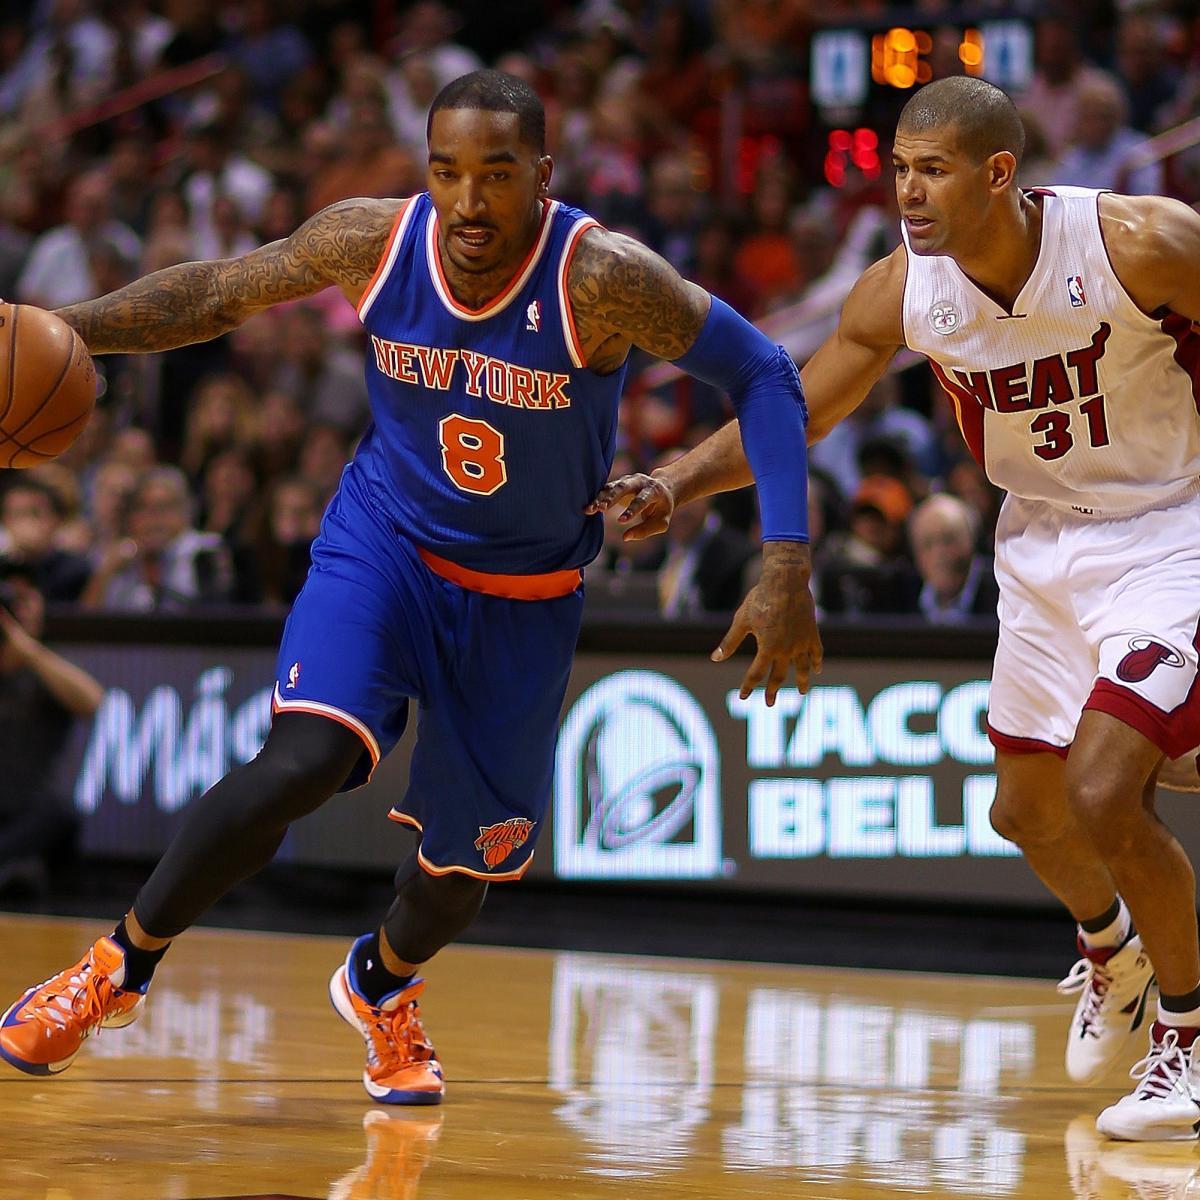 NBA Playoffs: Has J.R. Smith Earned An Eight-Figure Deal